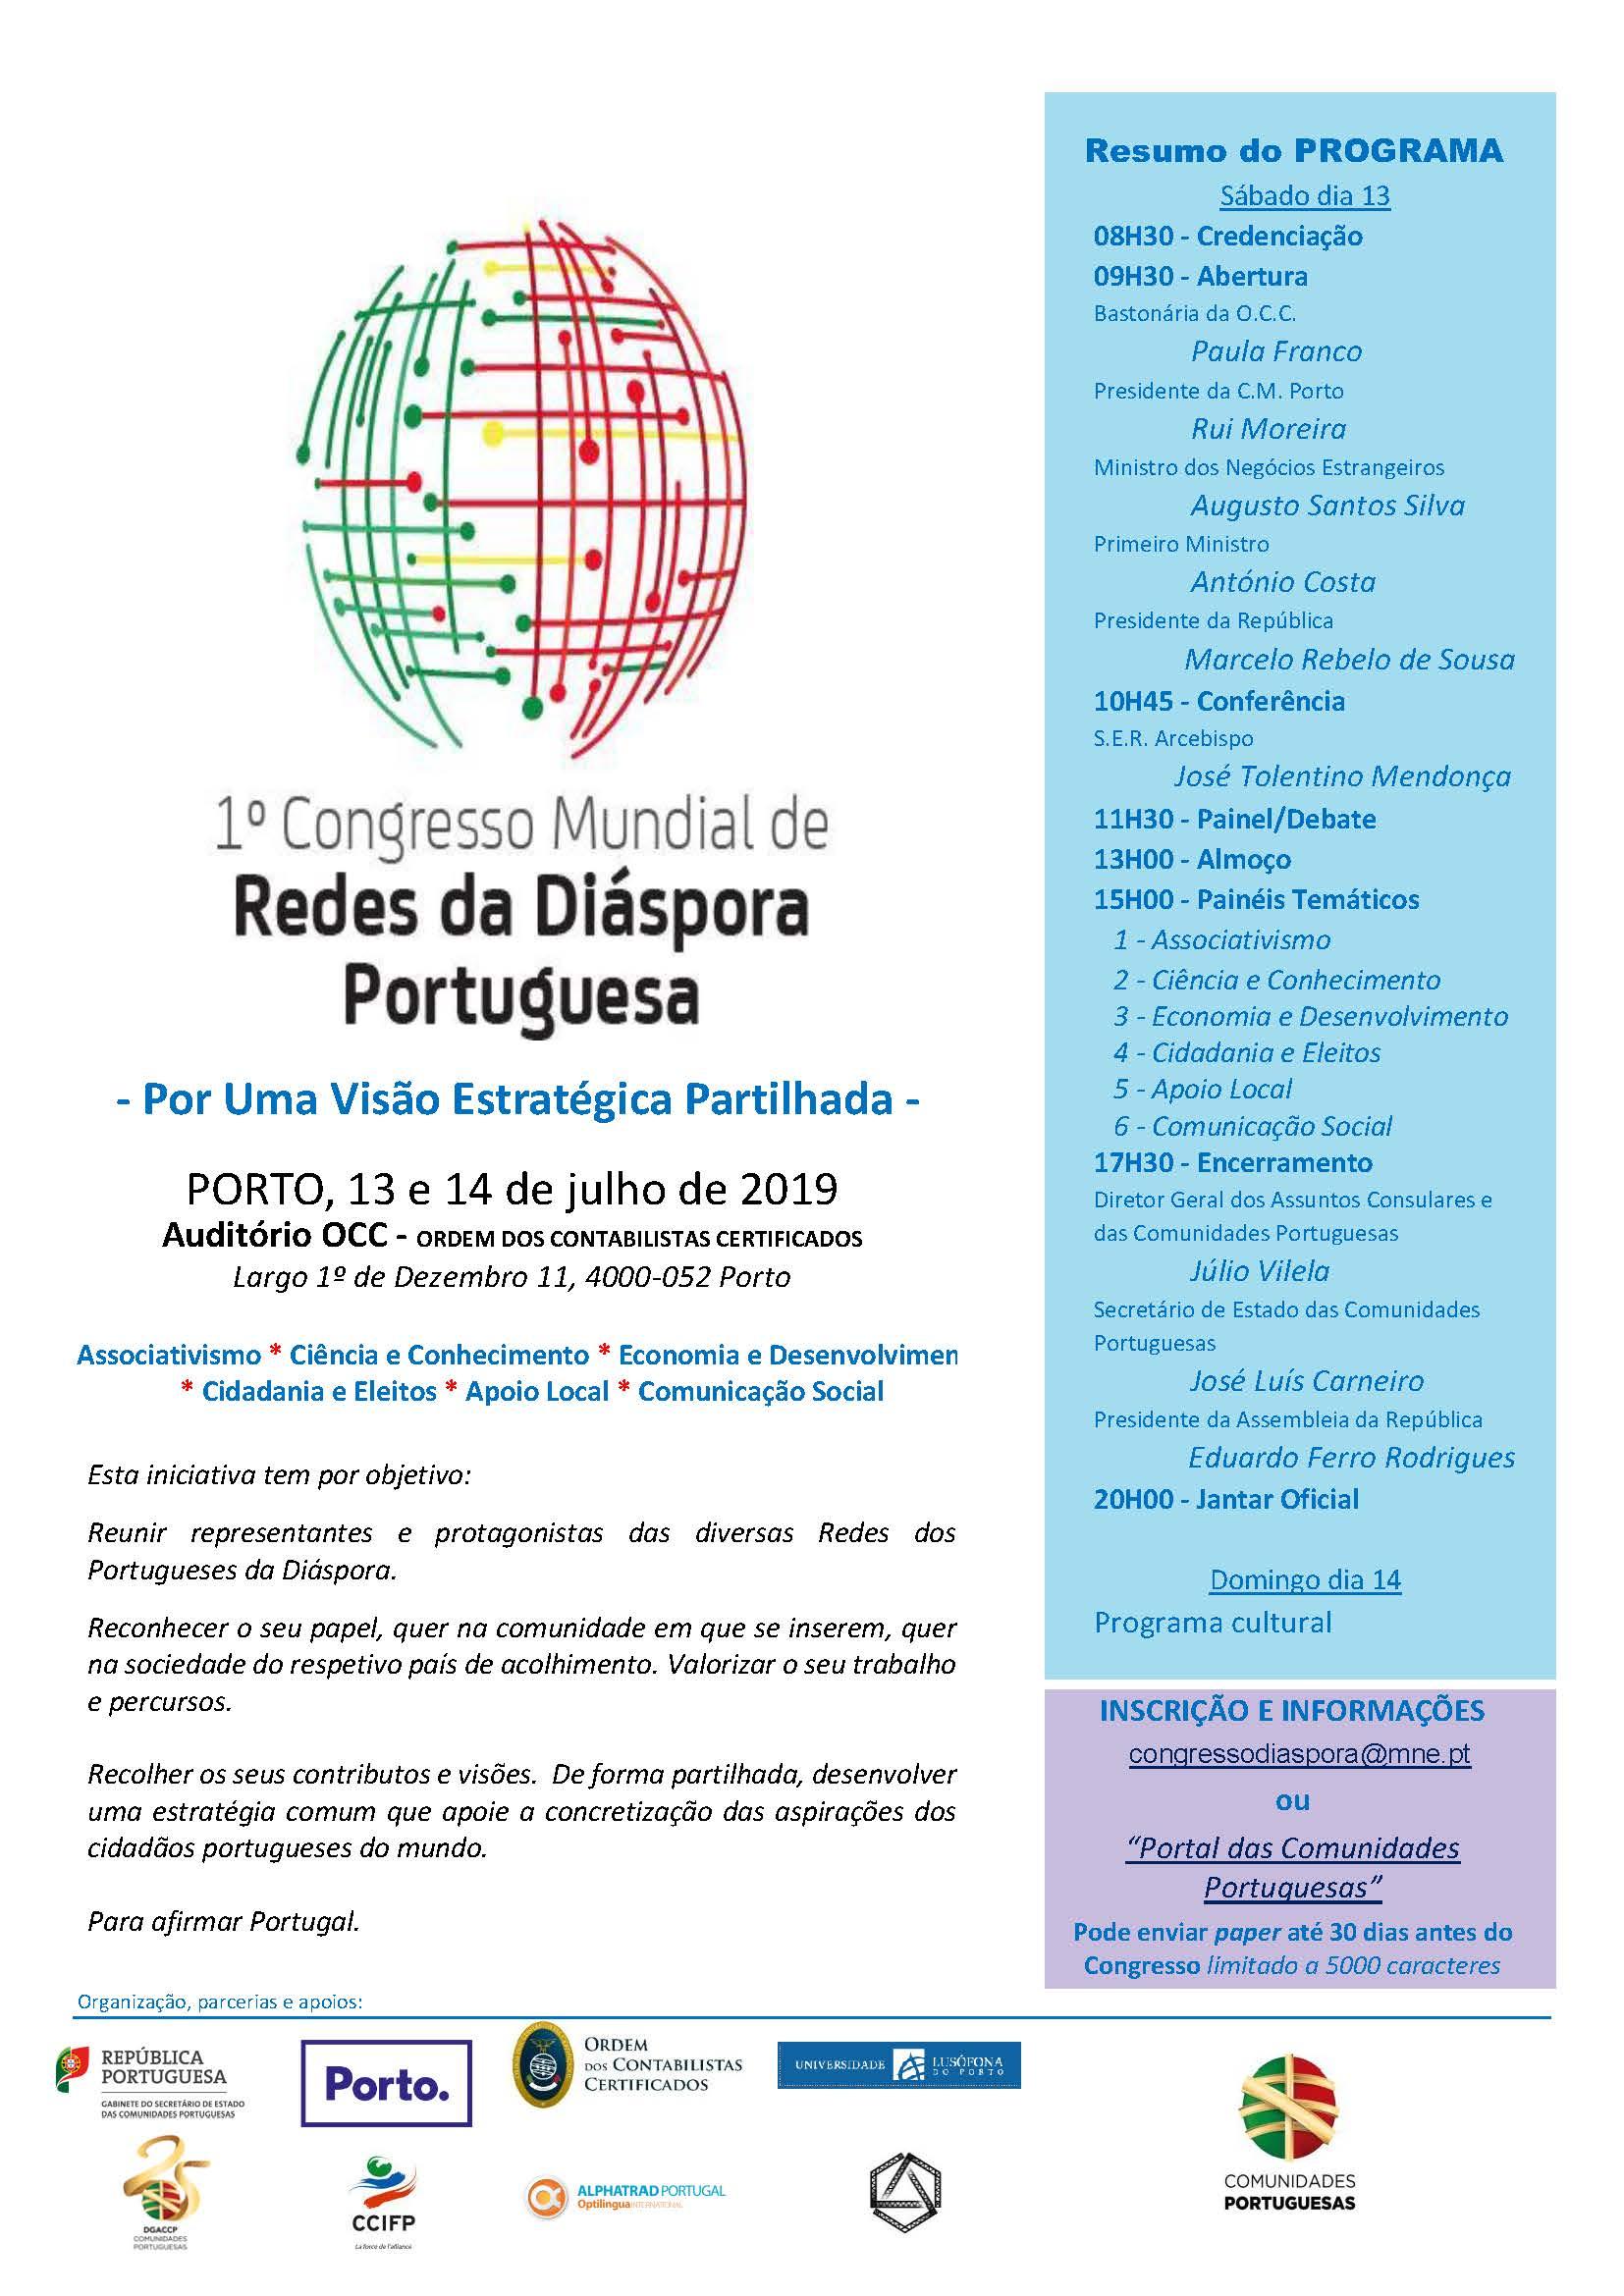 CongressoMundialRedesDiasporavfff V2